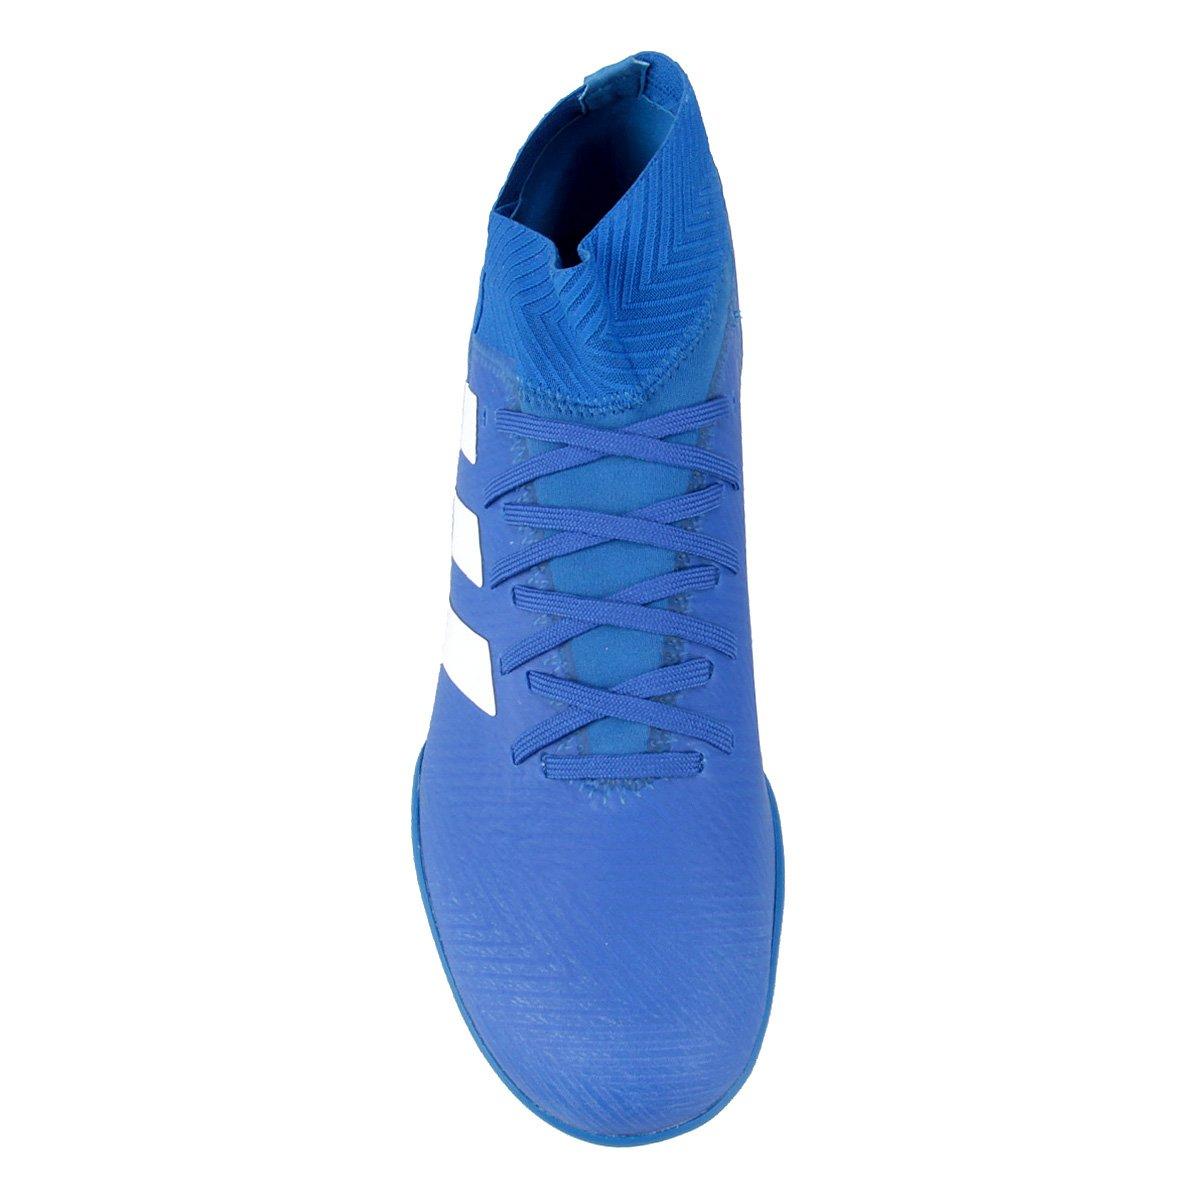 Tango Chuteira e 18 Masculina 3 Society TF Branco Adidas Nemeziz Azul qqwgfSt1